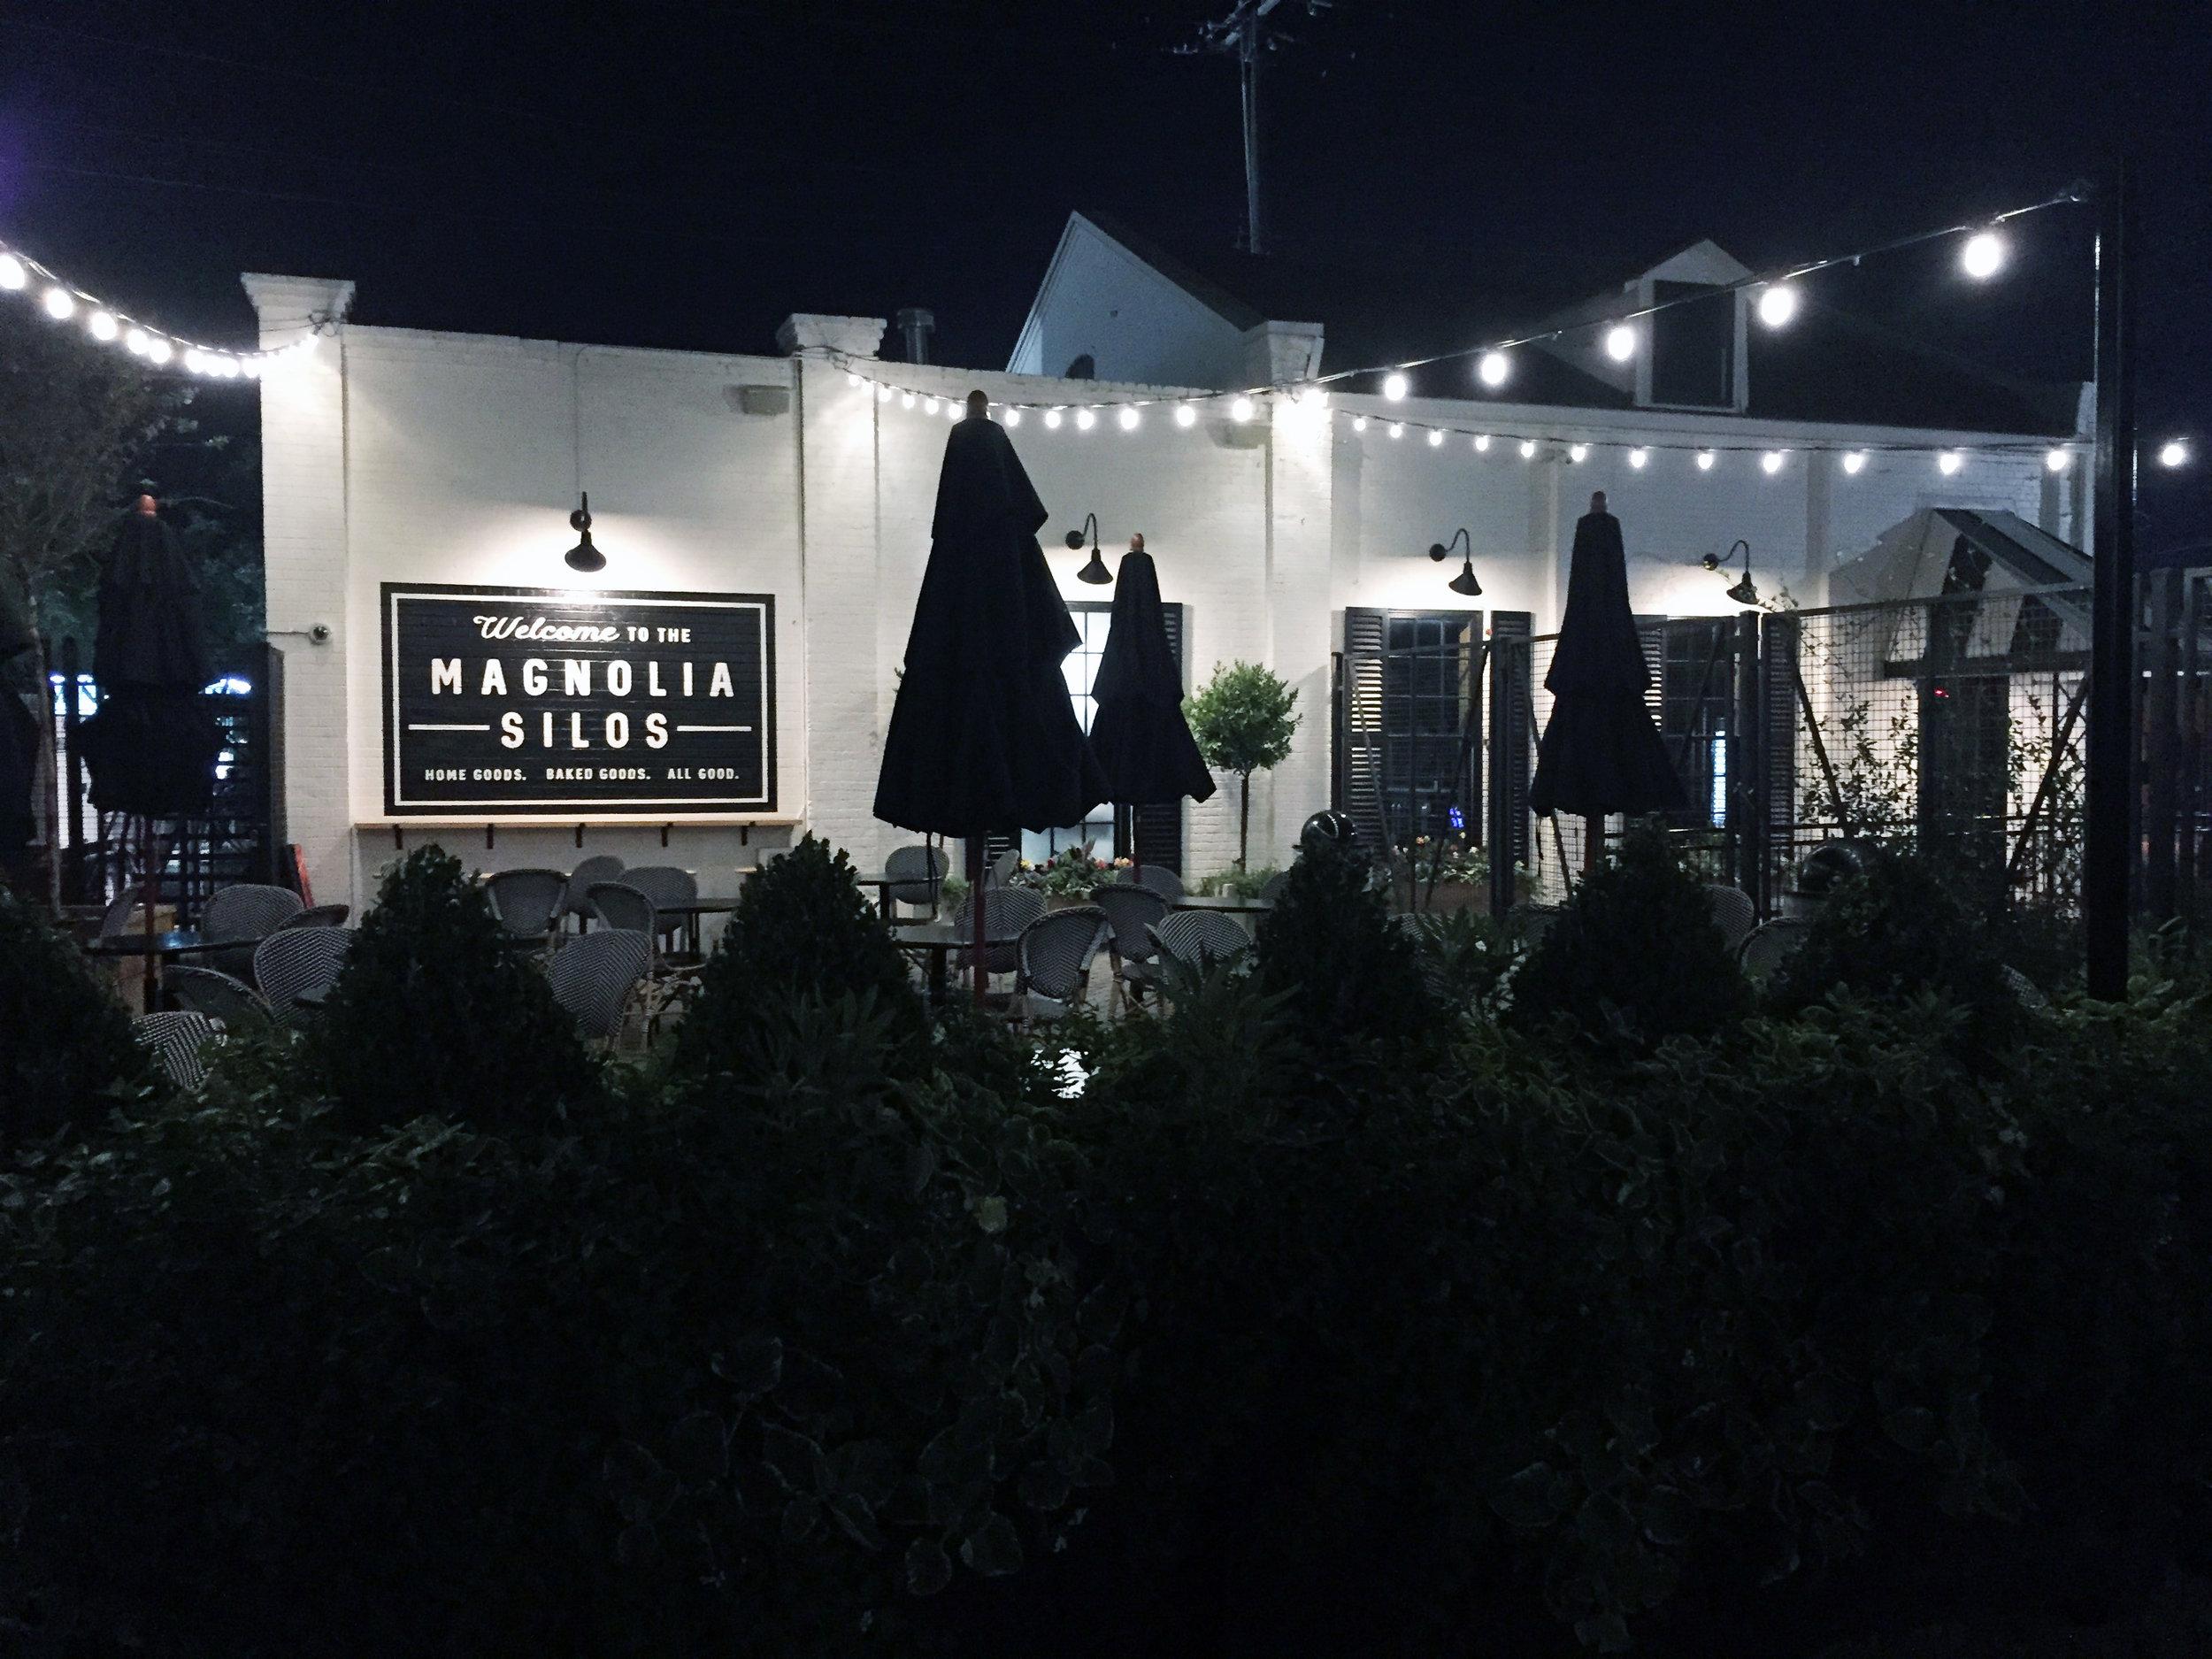 The Bakery at night!